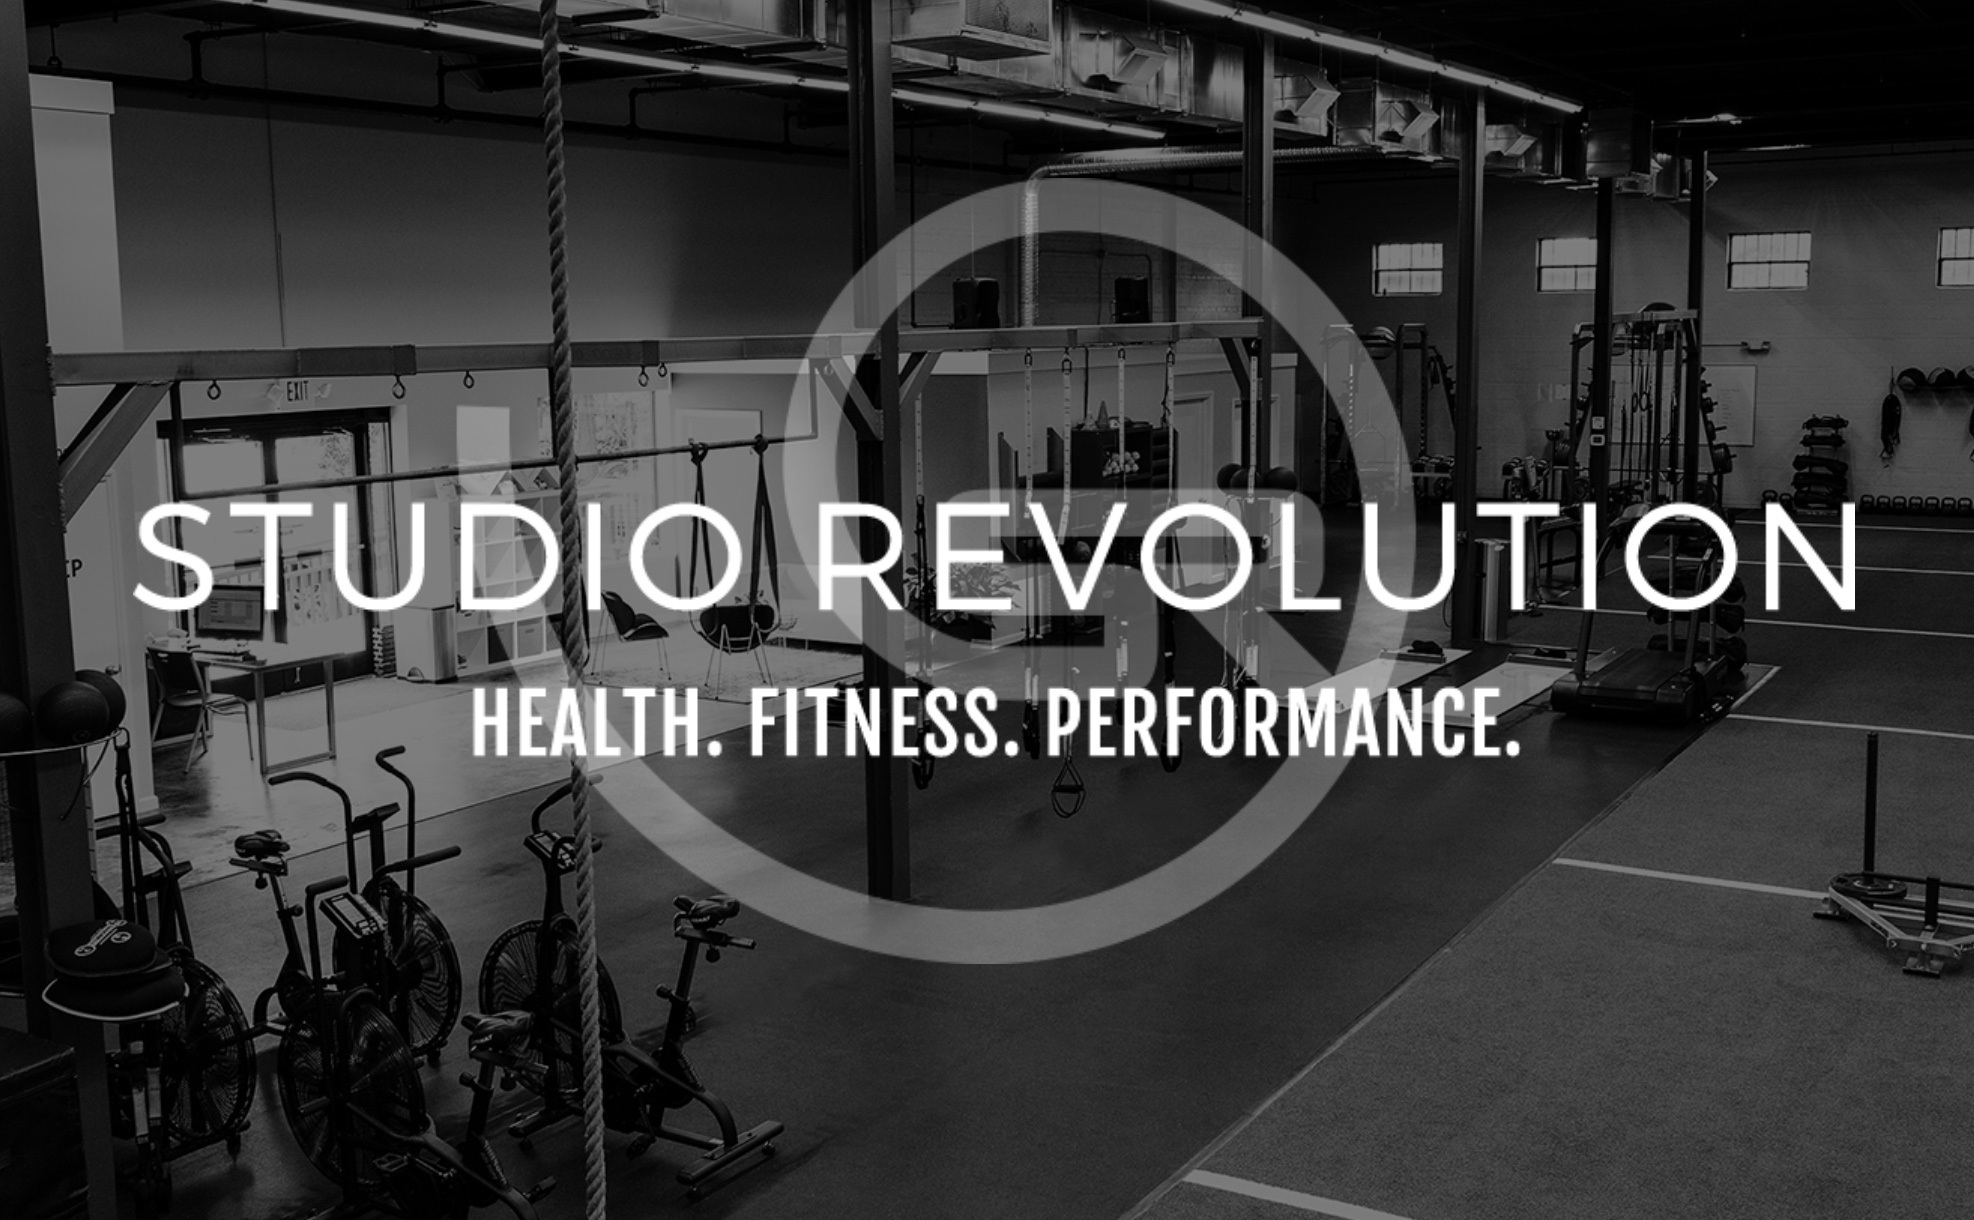 Studio-Revolution